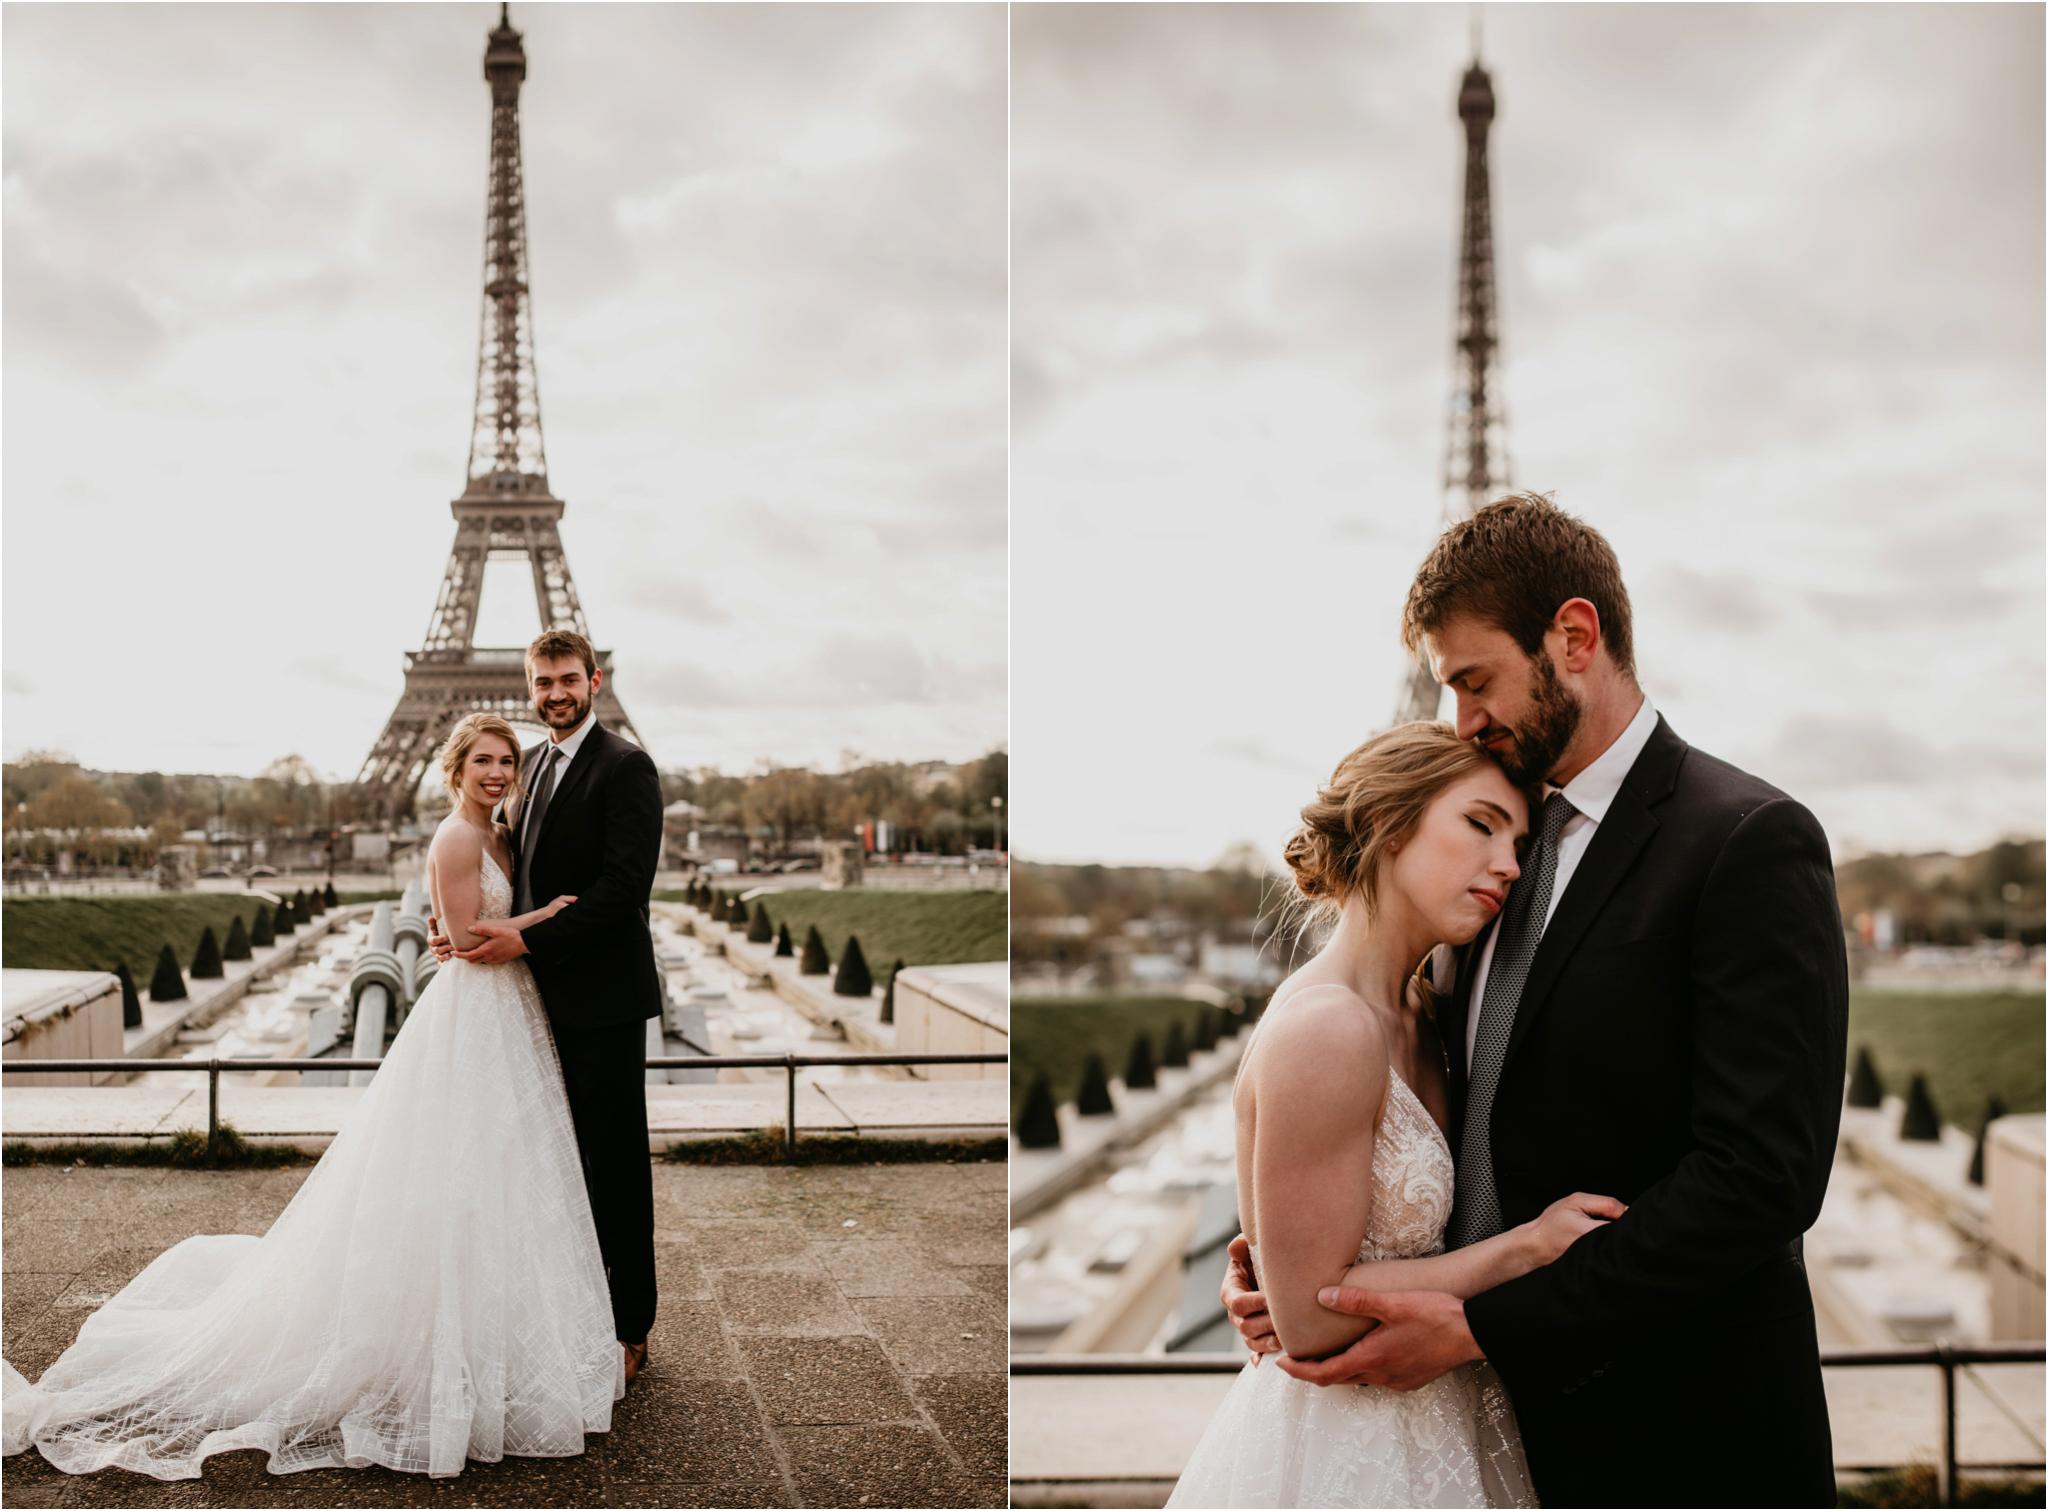 miranda-and-jared-paris-elopement-destination-wedding-photographer-071.jpg